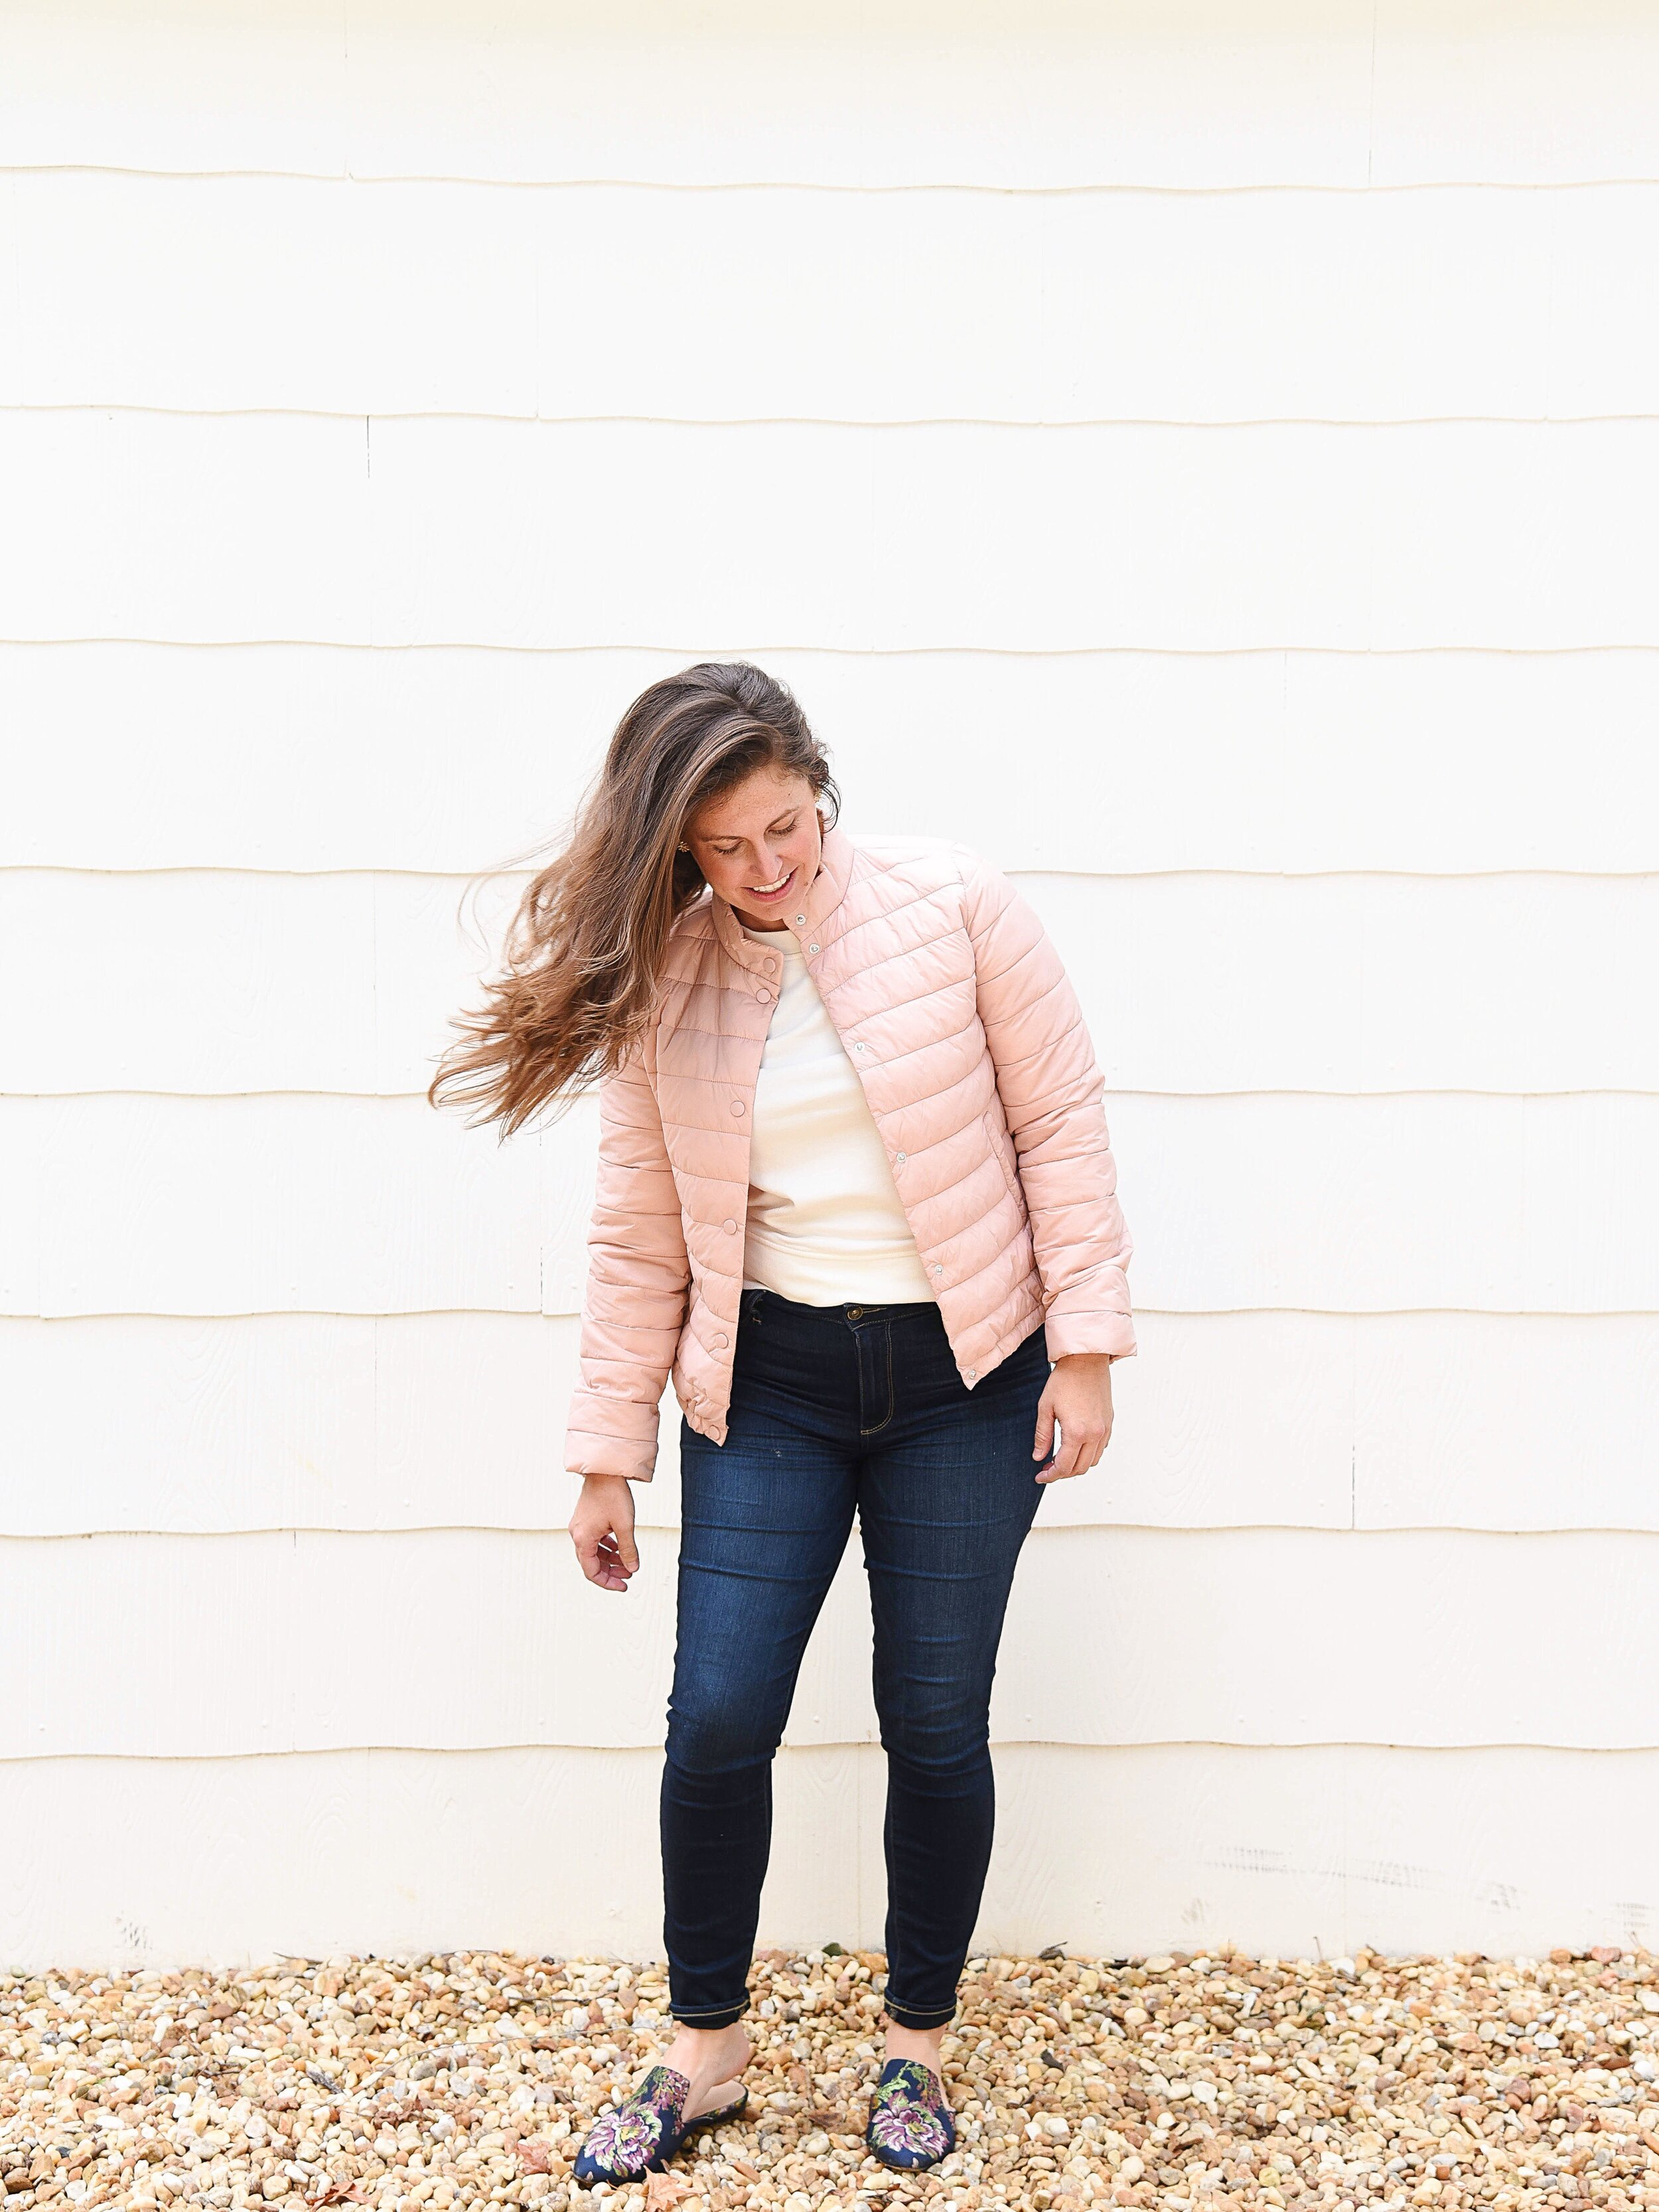 Top :    Crewneck Pullover, Color Cream    | Jacket :    Quilted Puffer Jacket Color Pink    | Shoes:   Flower Slides